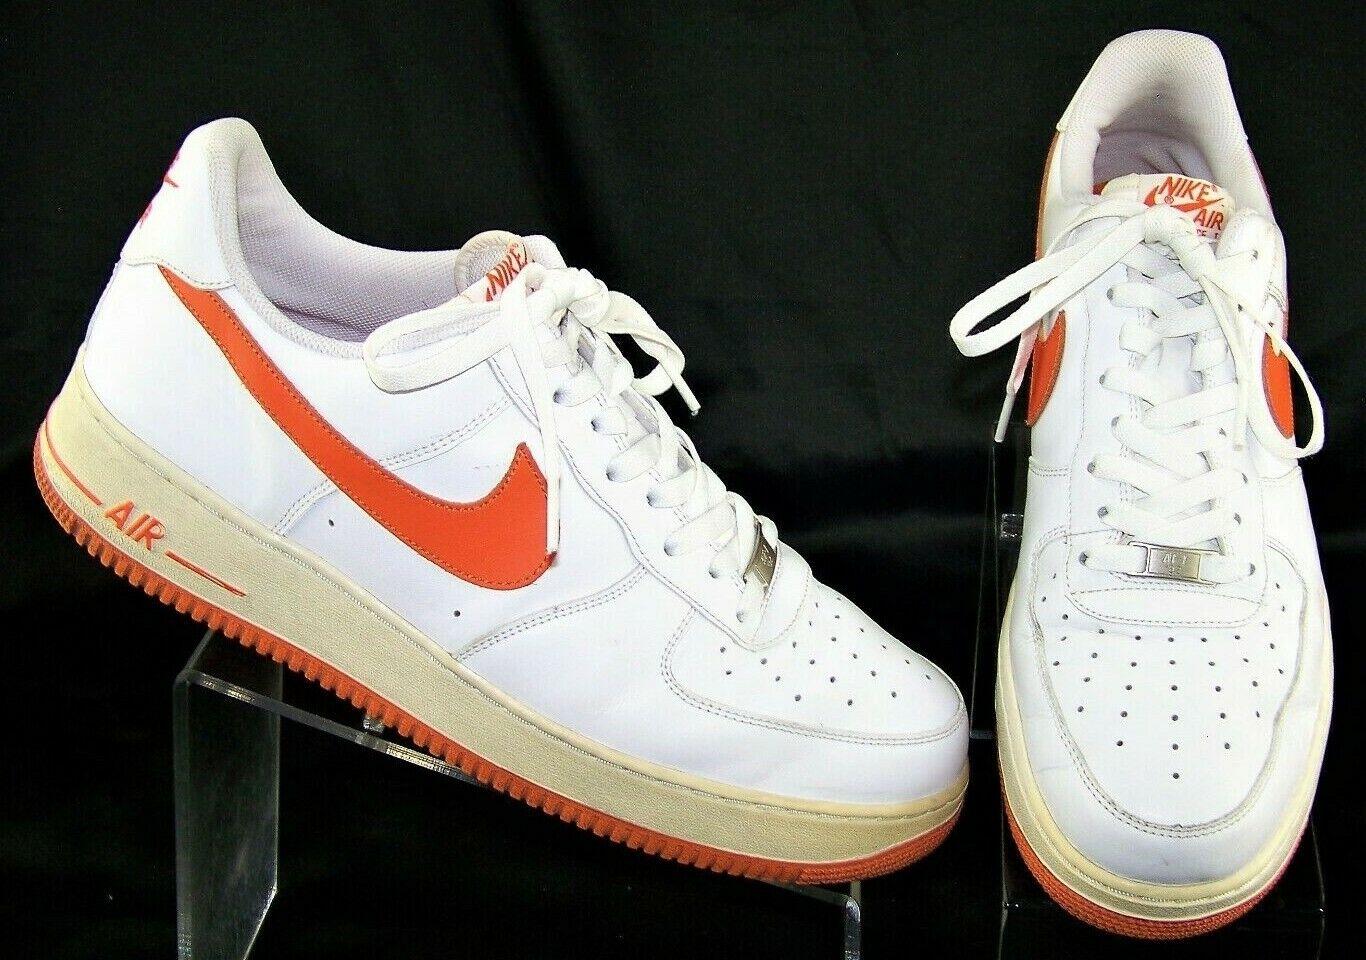 NIKE Air Force 1 White Orange Blaze Low 315122-181 Men Basketball Shoes US 13